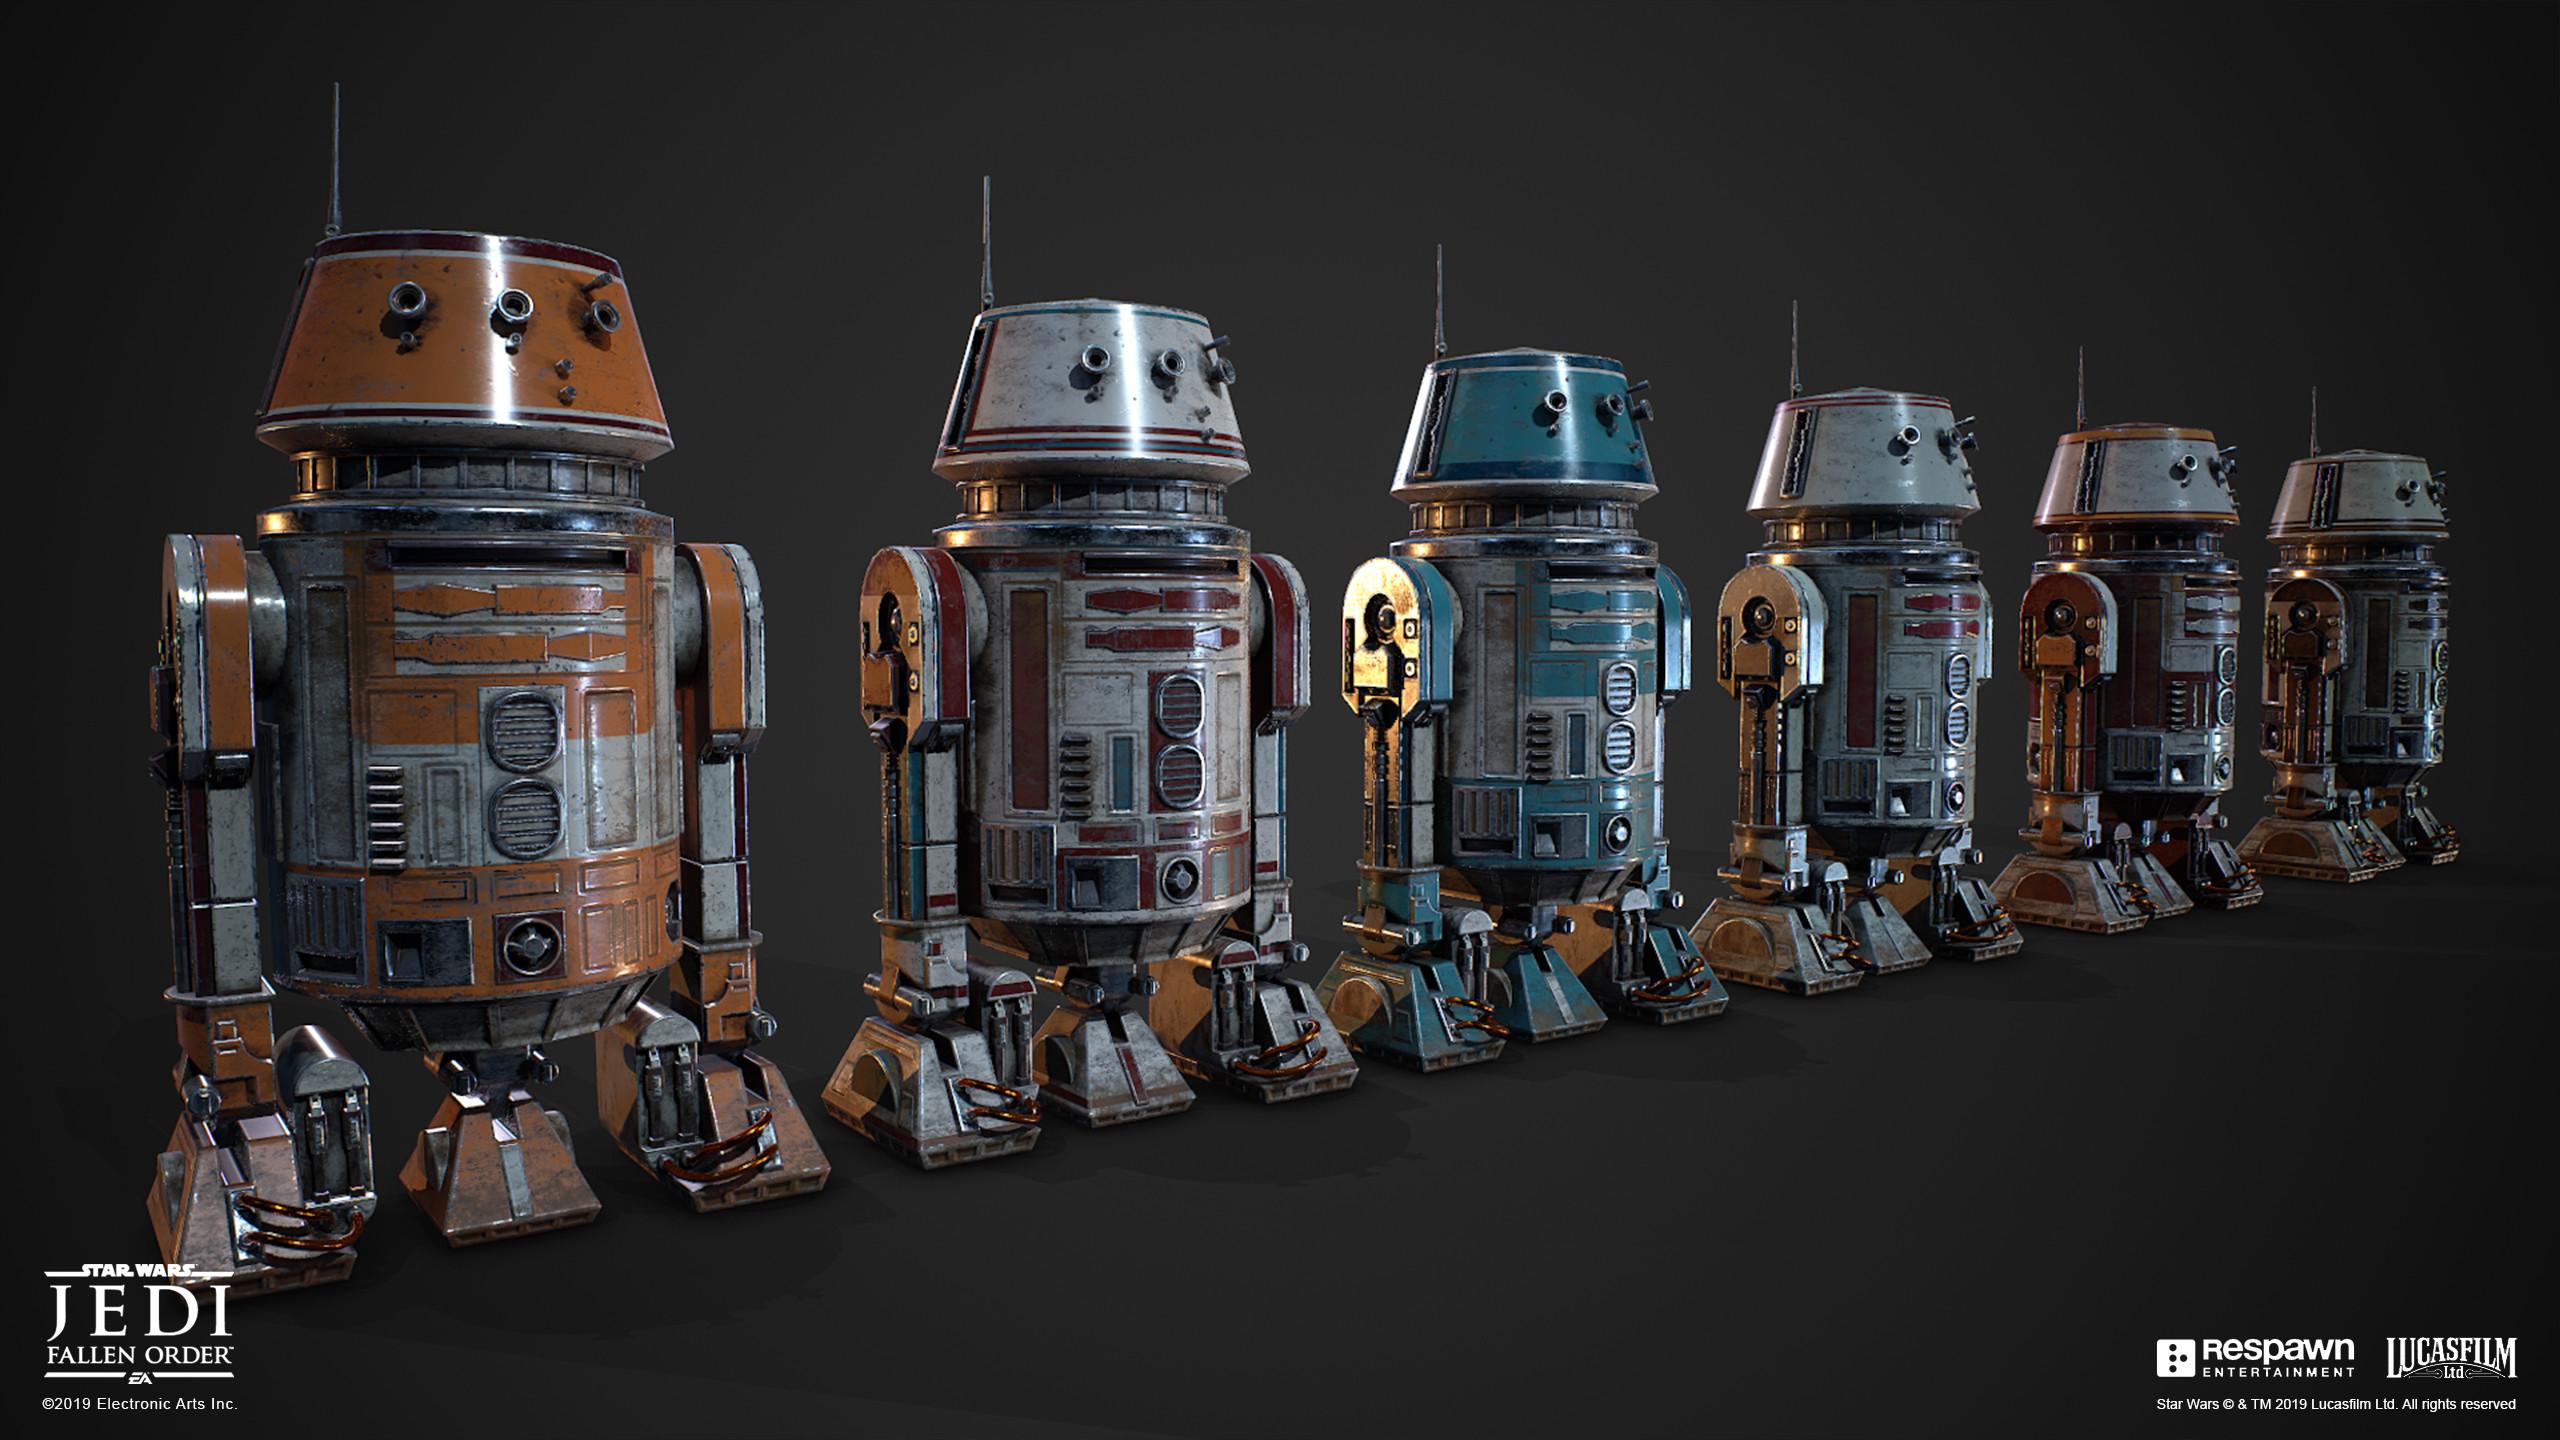 Evan Cwiertny S Portfolio Star Wars Jedi Fallen Order Bracca And Flashback Droids